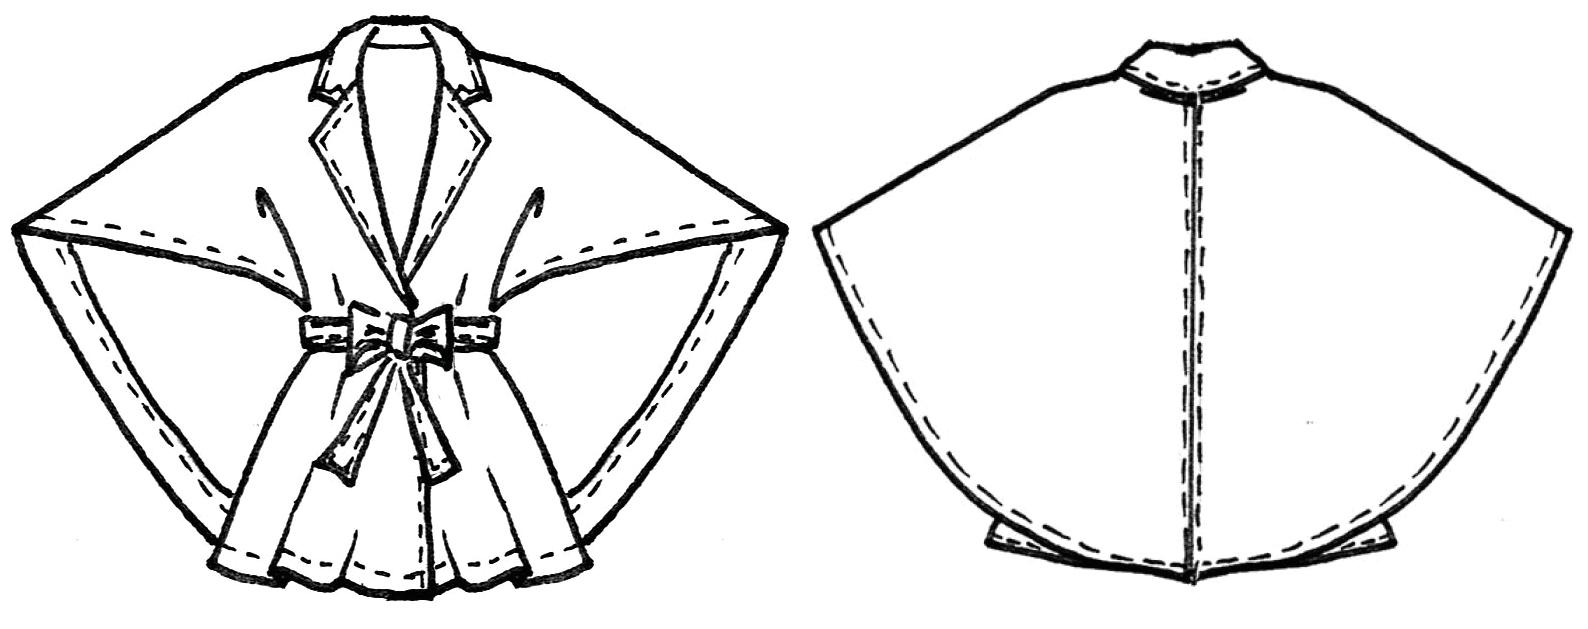 Schnittkonstruktion Capejacke